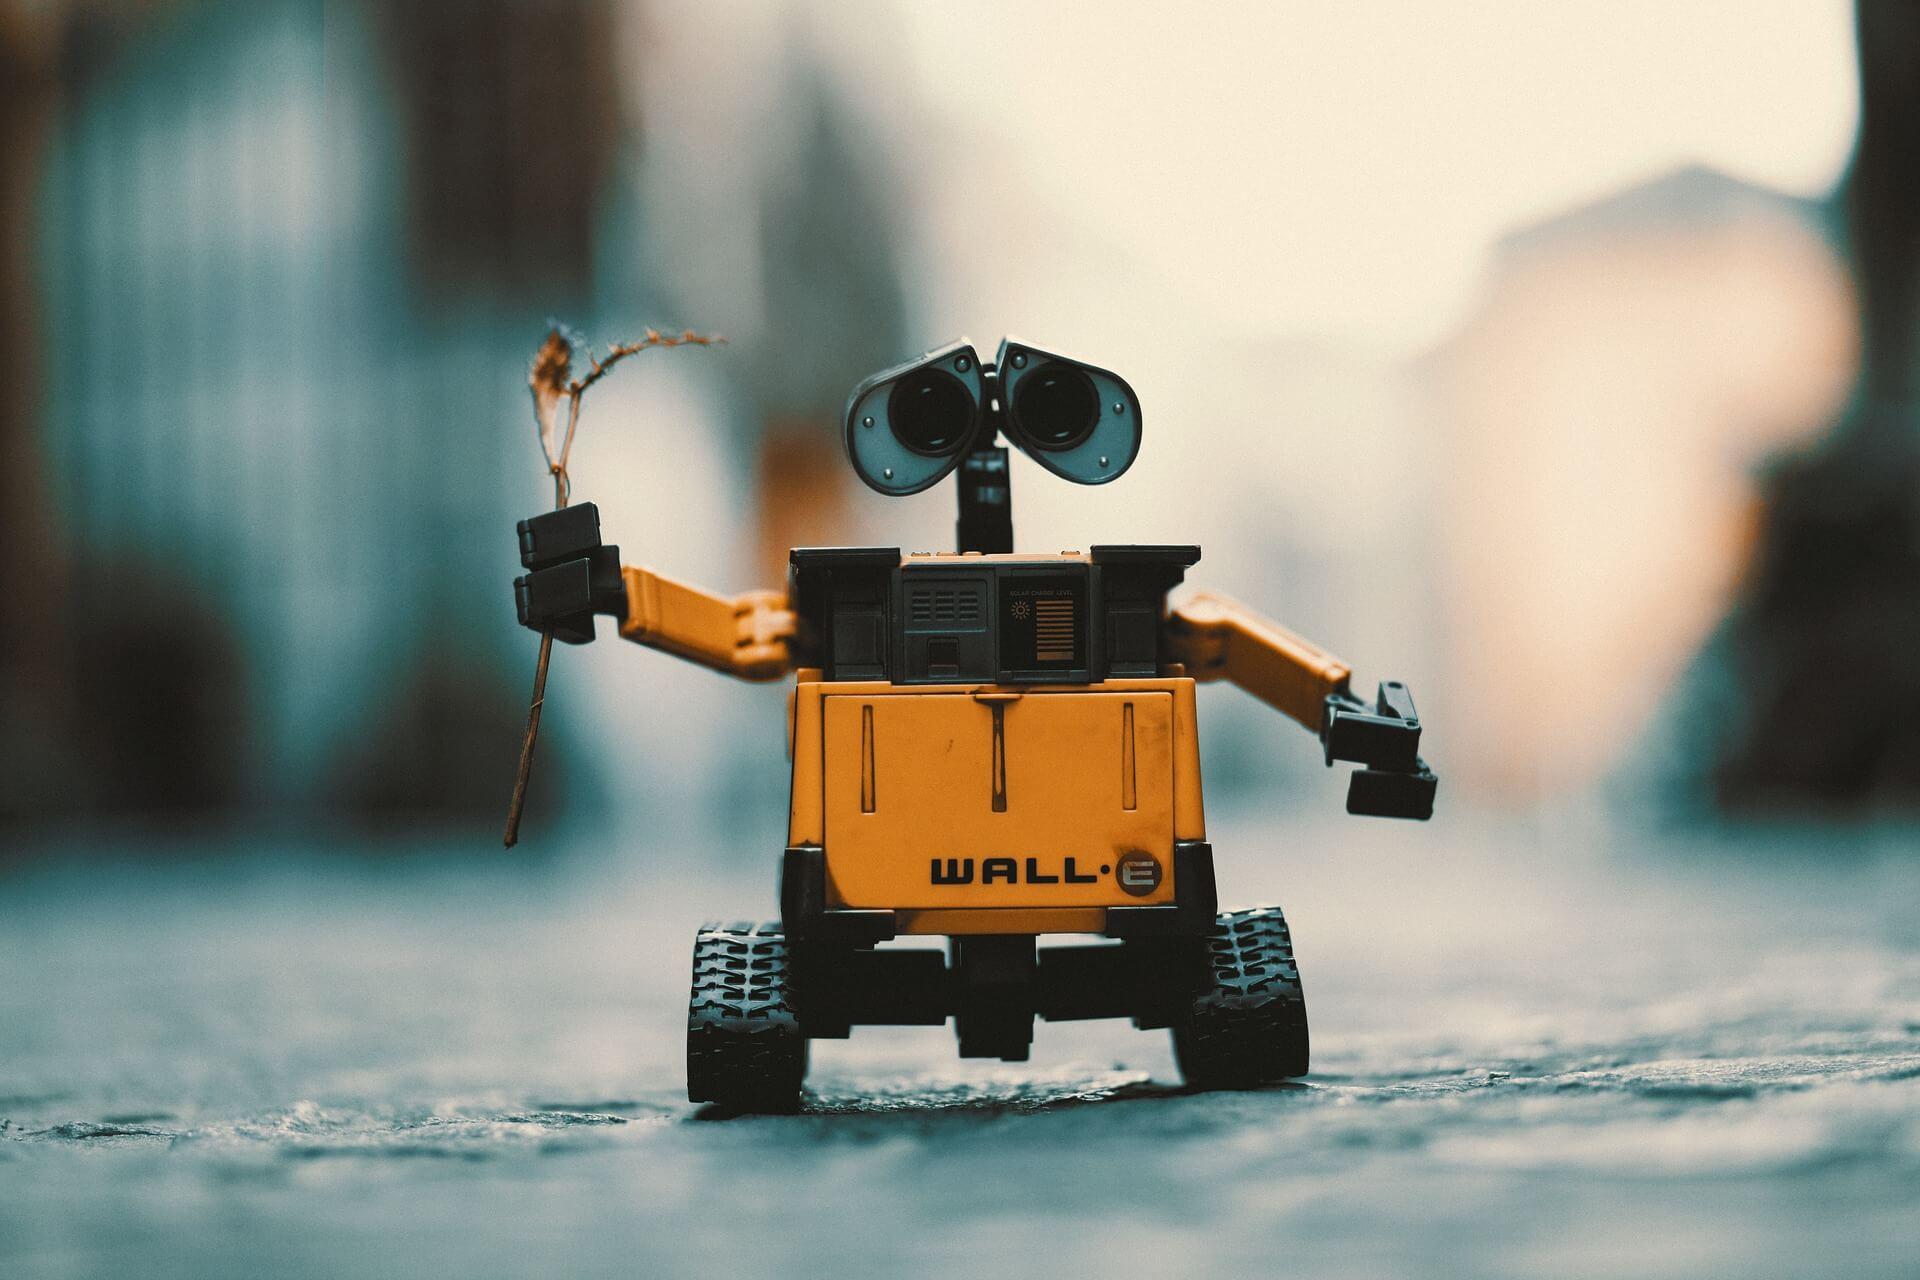 Image of Wall-E character